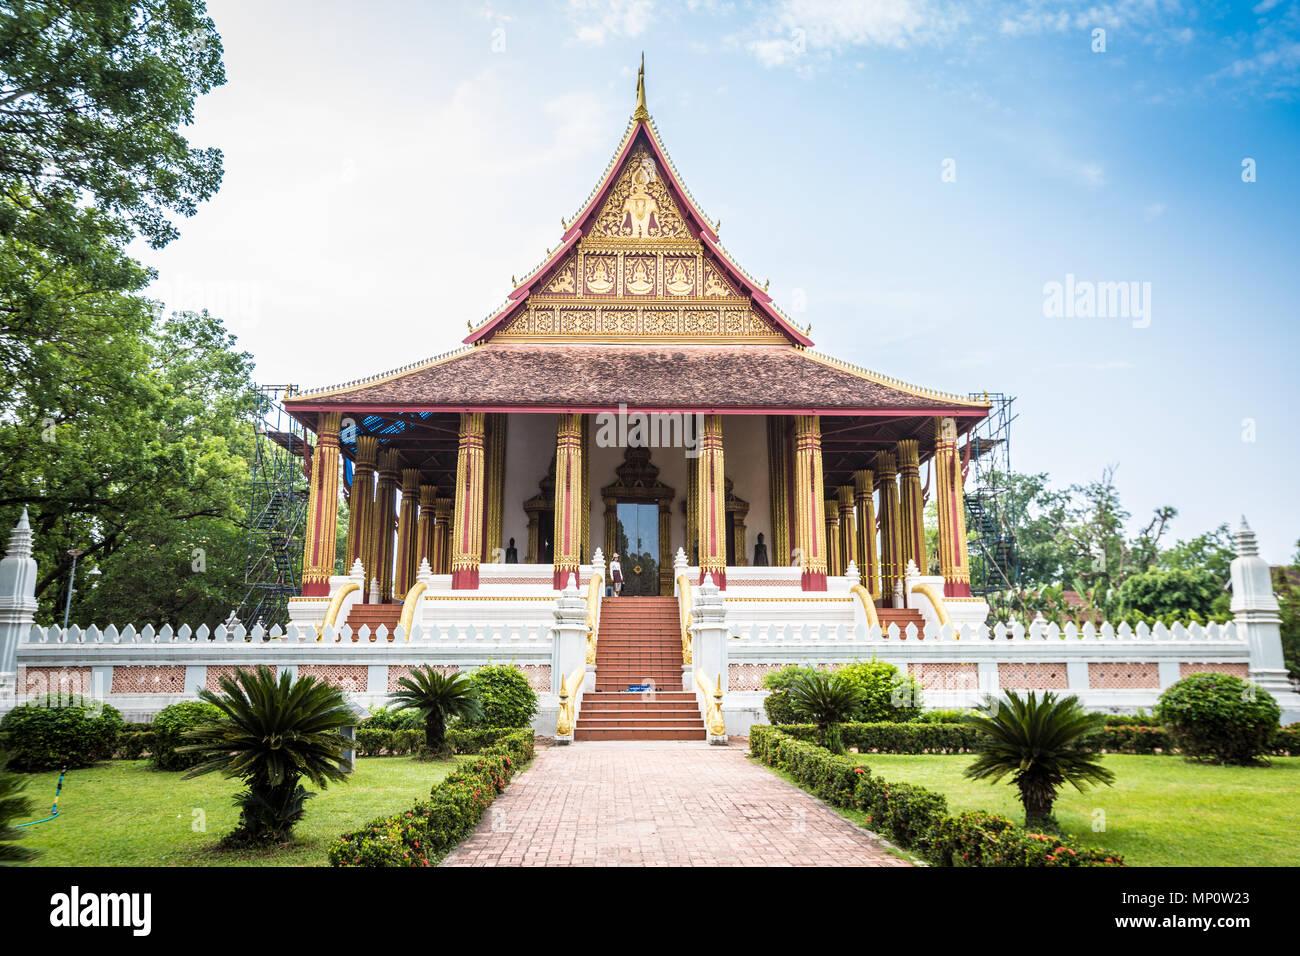 Wat Phra Kew Temple in Vientiane Laos - Stock Image